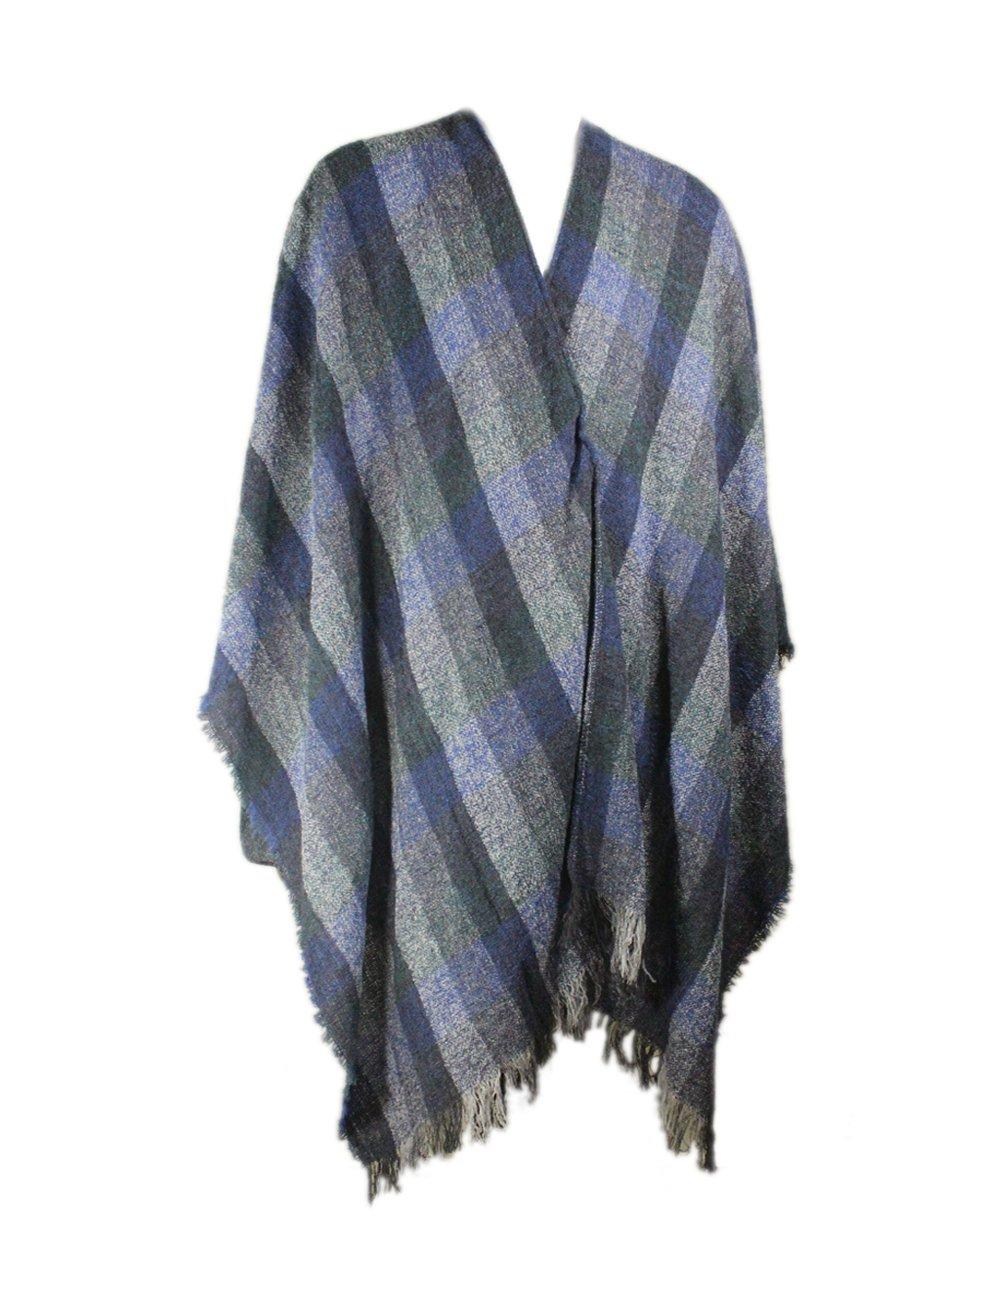 "Biddy Murphy Ruana Wool Checkered Blue 54"" x 72"" Made in Ireland"